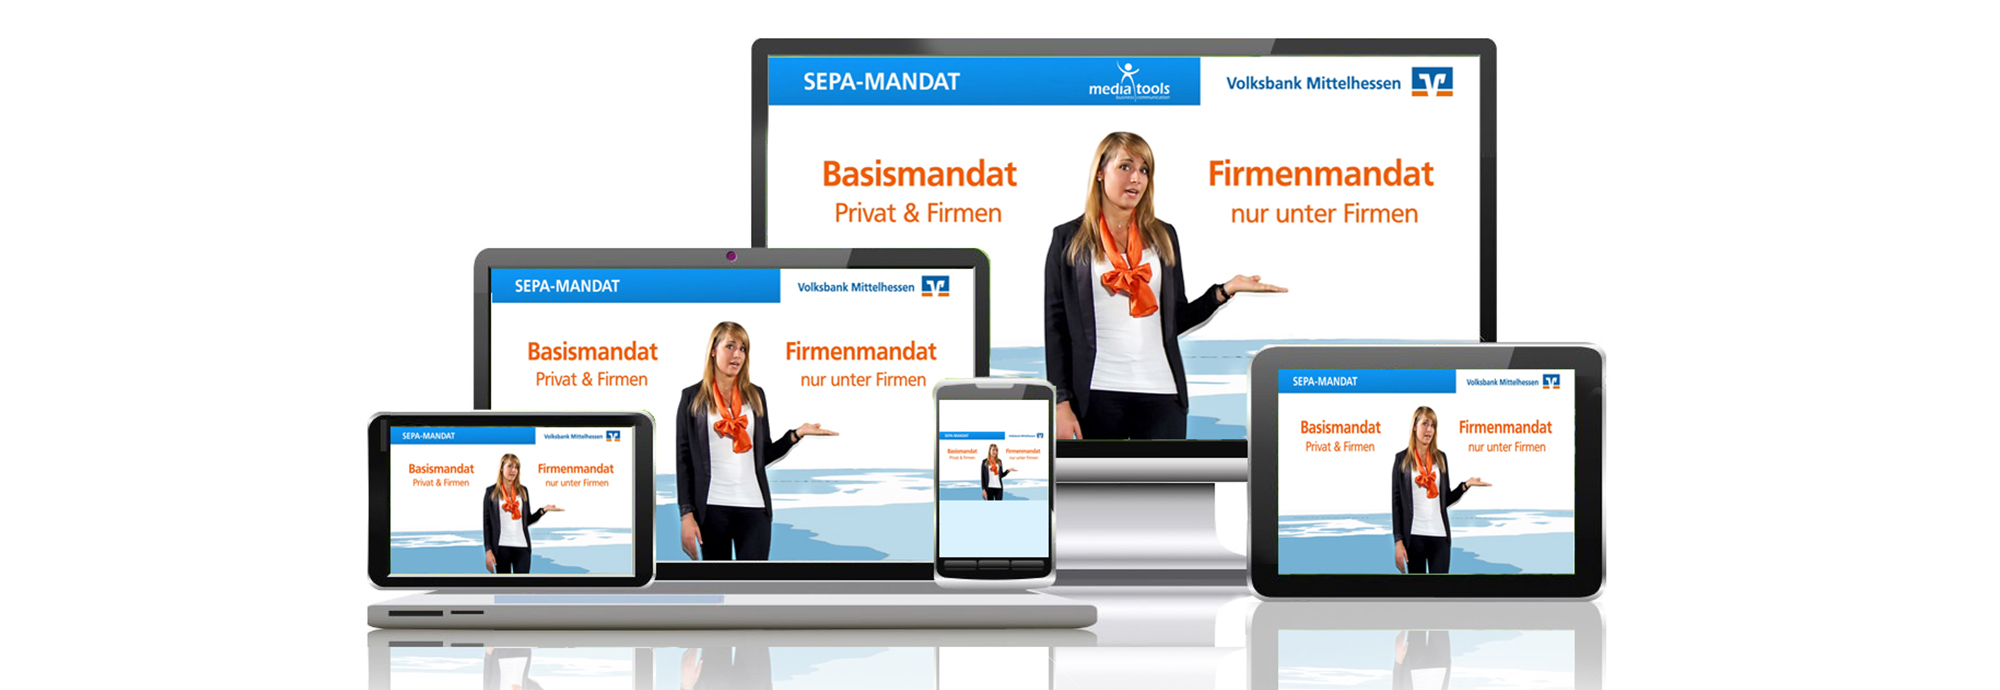 media tools - business communication: Agentur, Beratung und Produktion